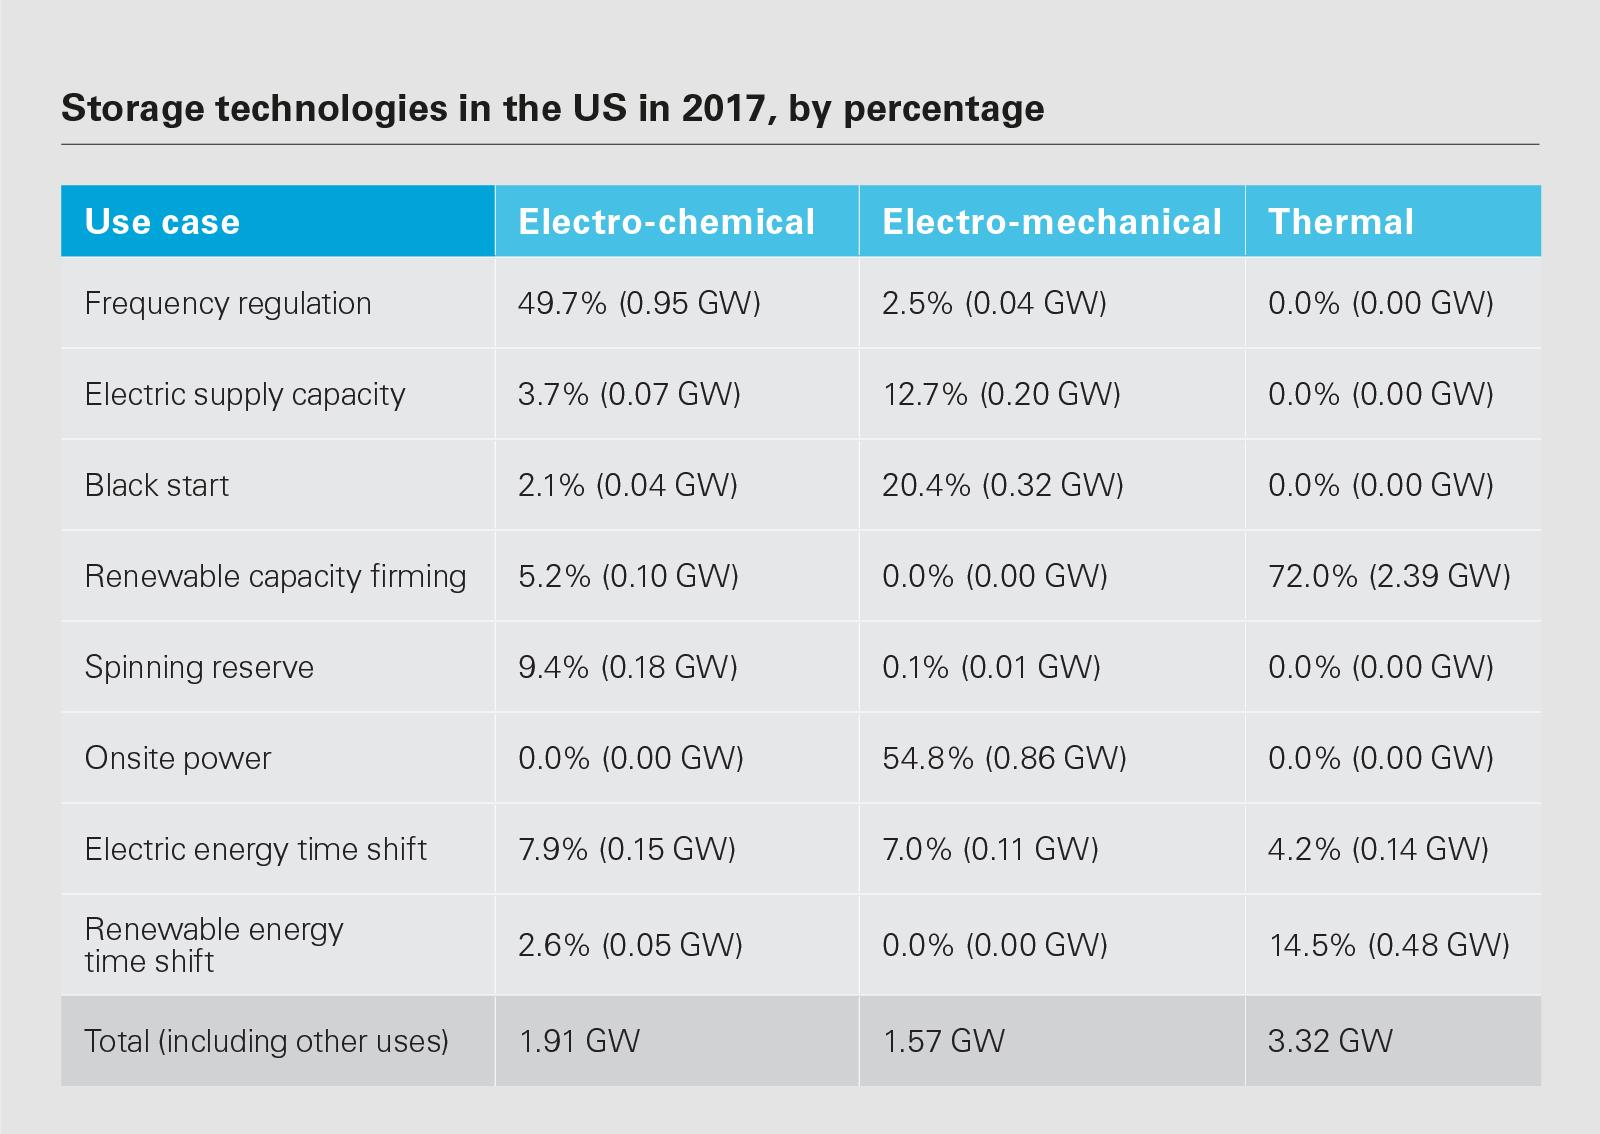 Energy_storage_LON0319065_Chart1_1600x900.png